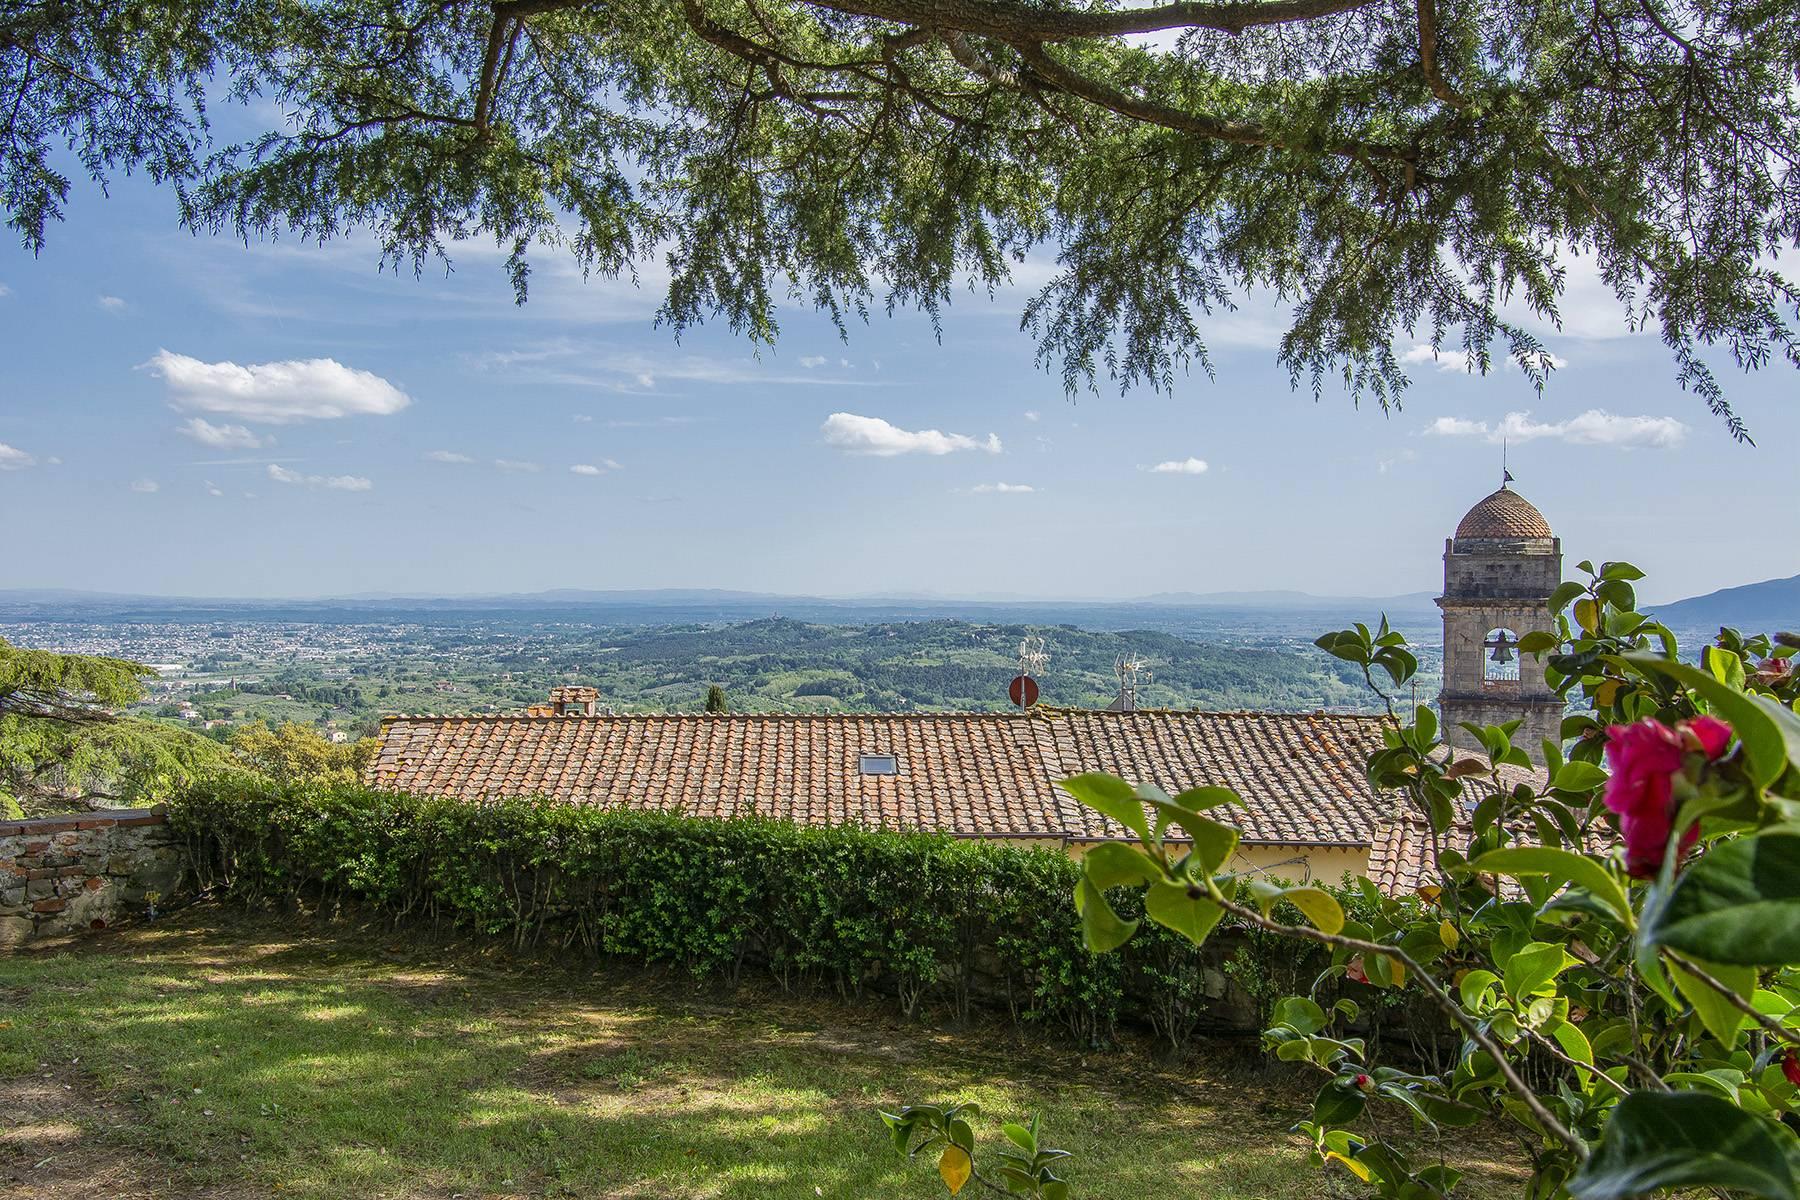 Villa in Vendita a Capannori: 5 locali, 380 mq - Foto 28